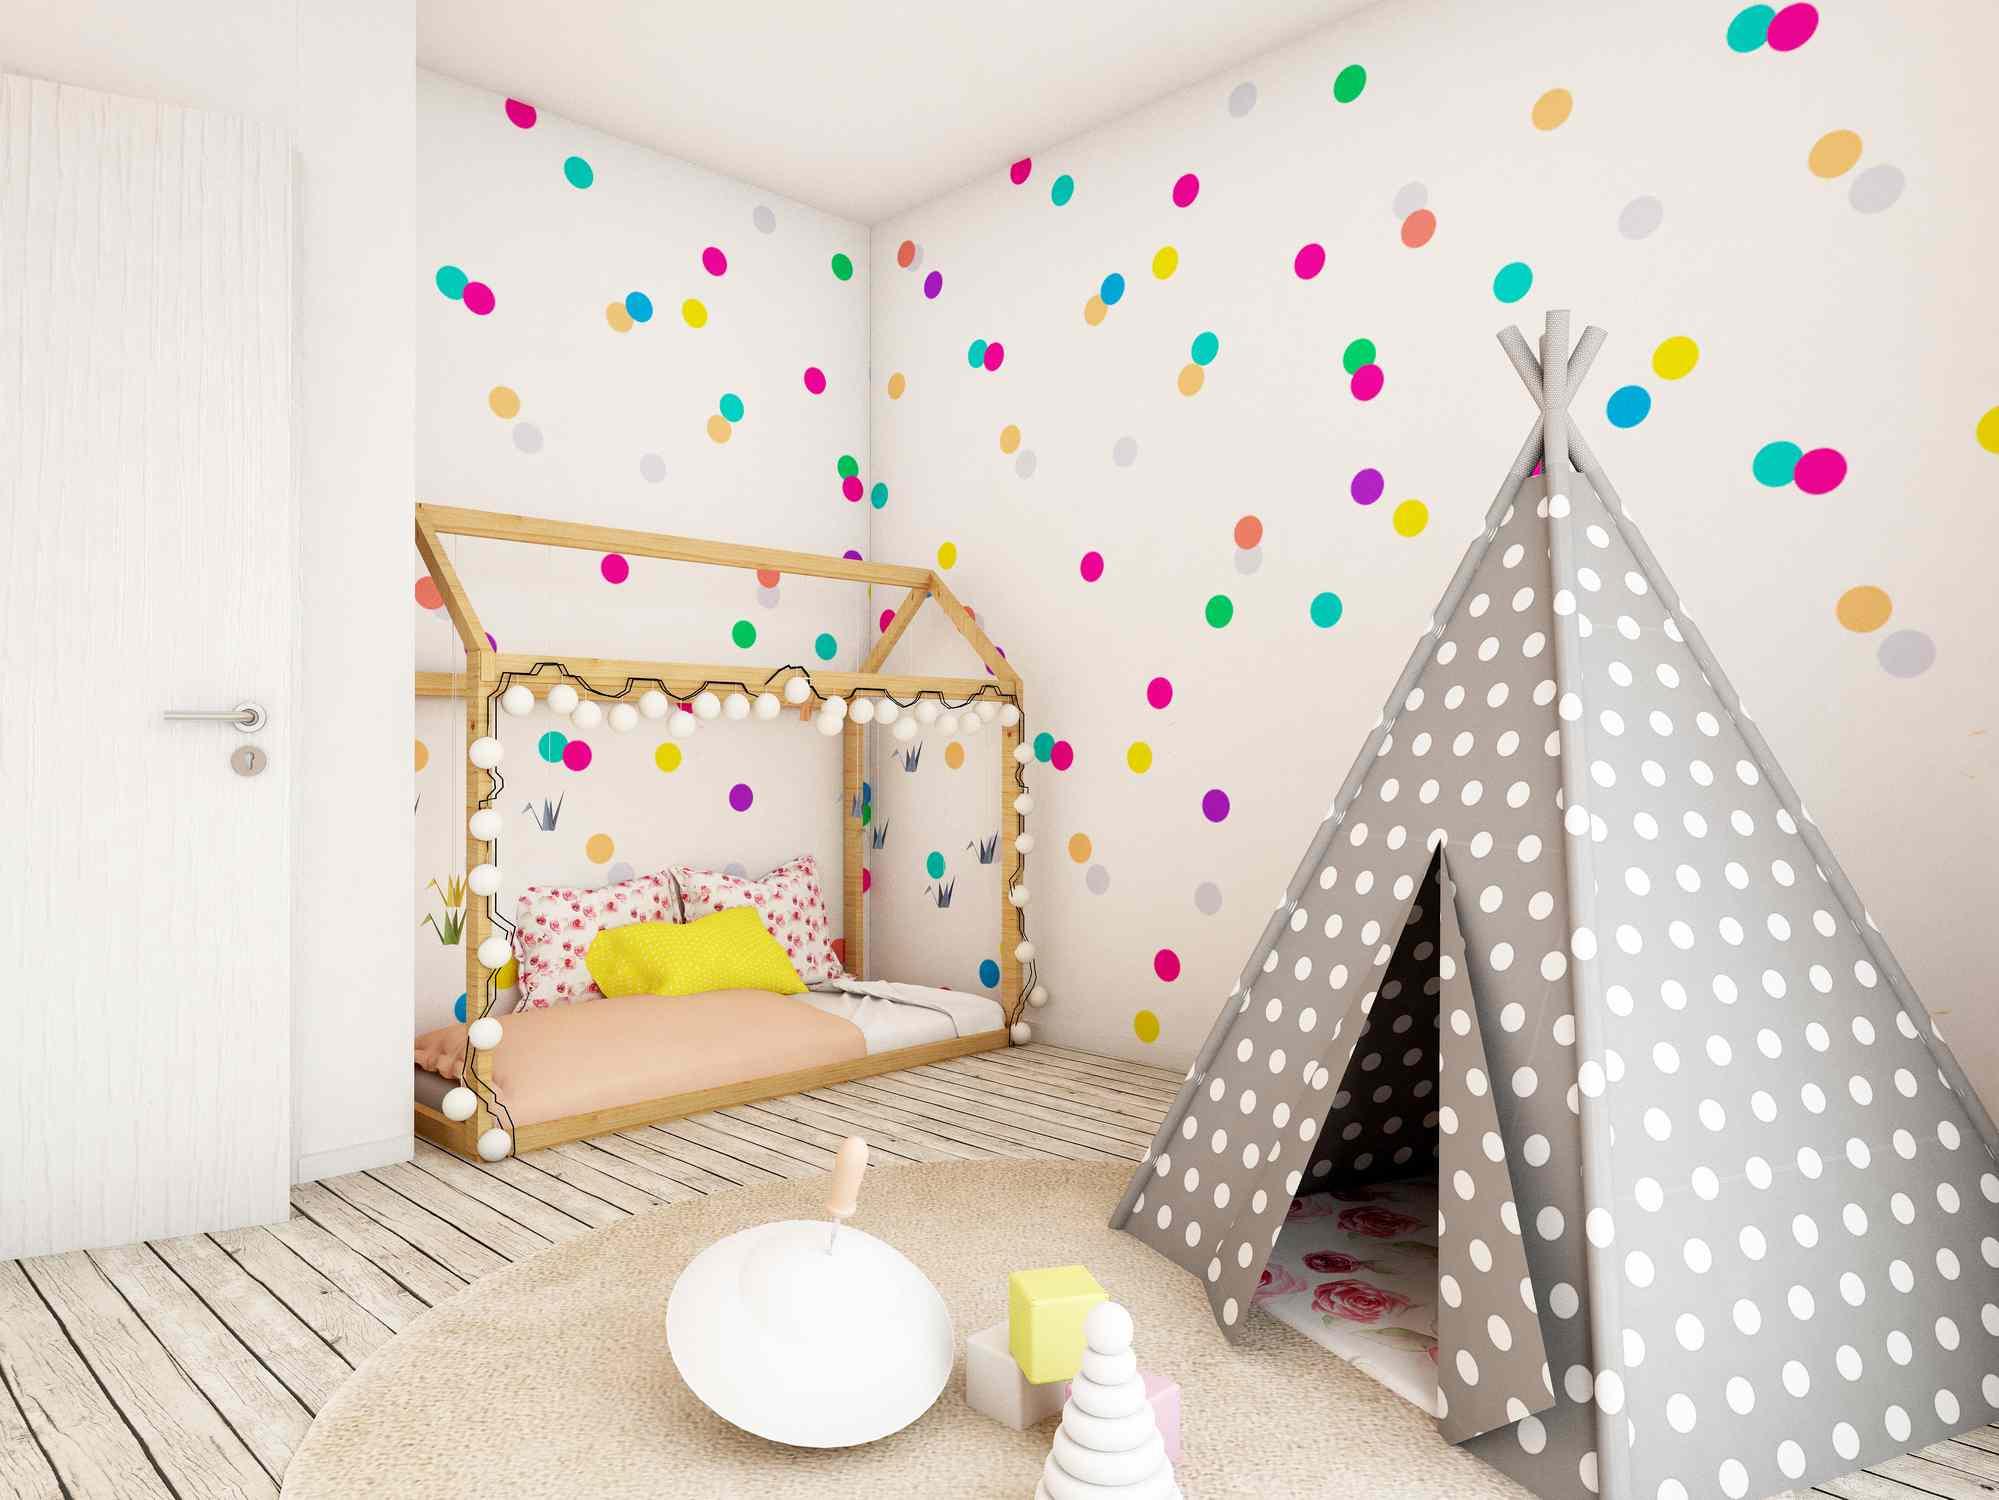 Bright polka dot wallpaper in a kids room.